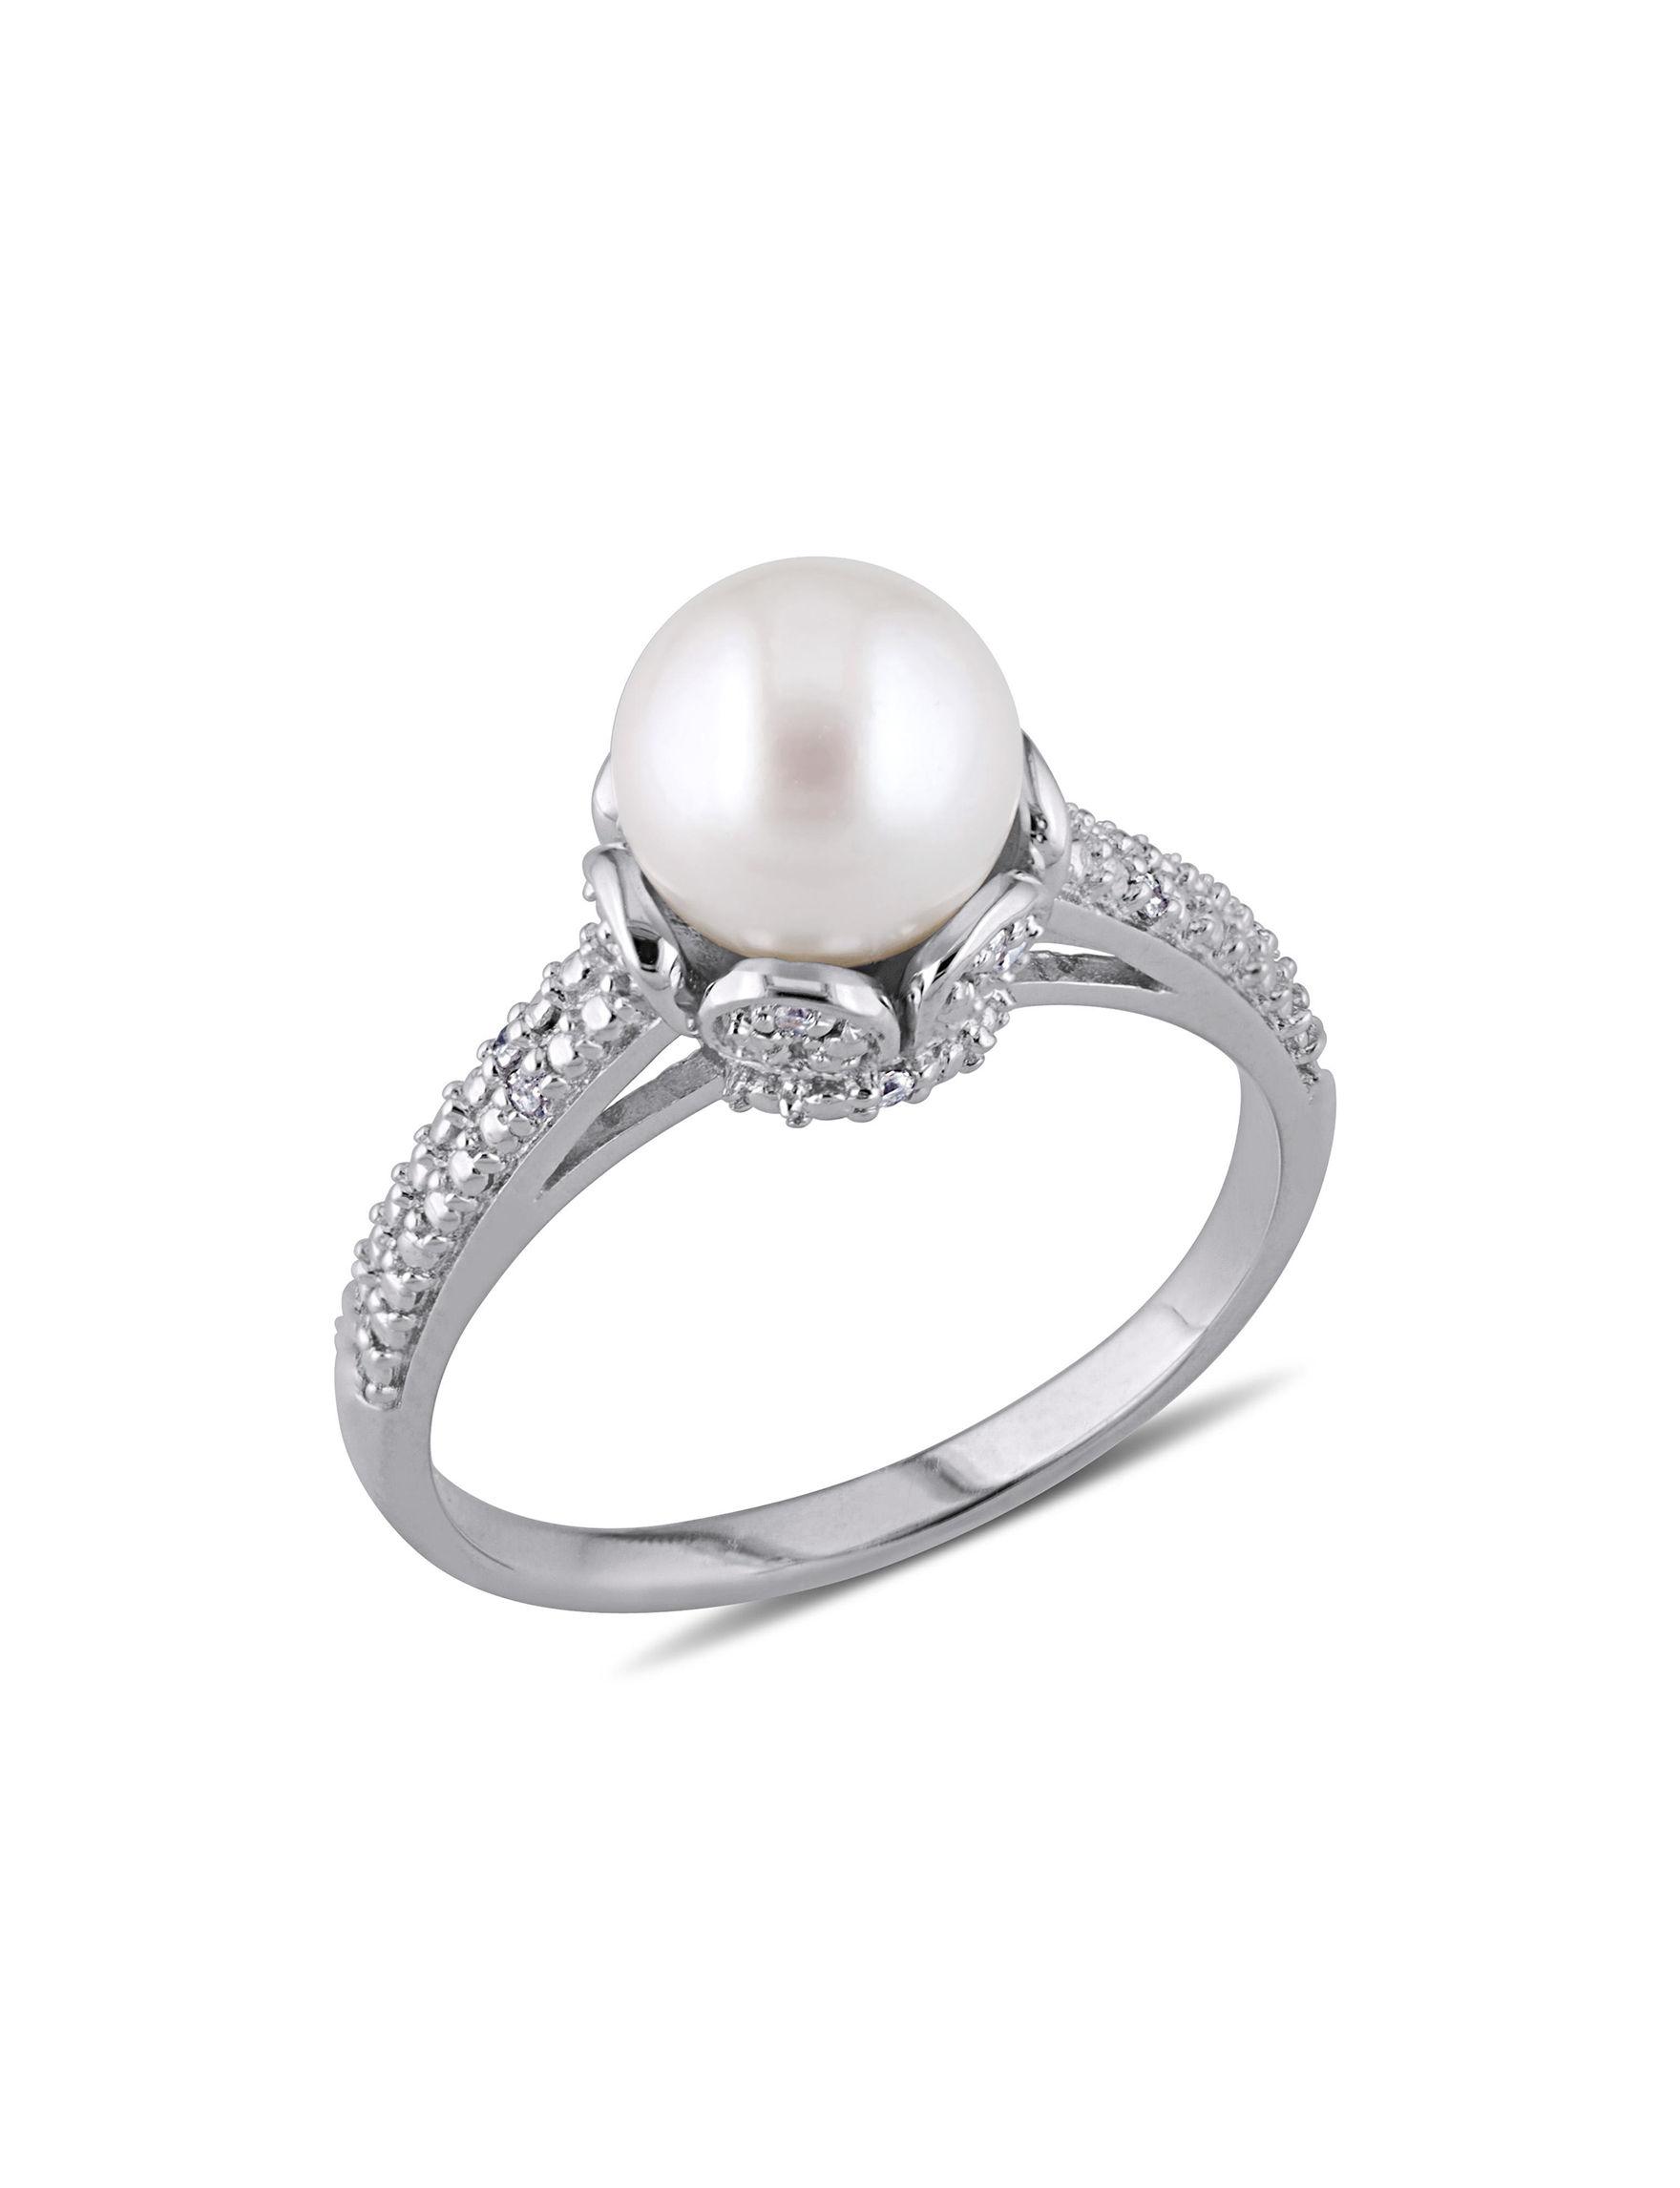 Michiko Silver Rings Fine Jewelry